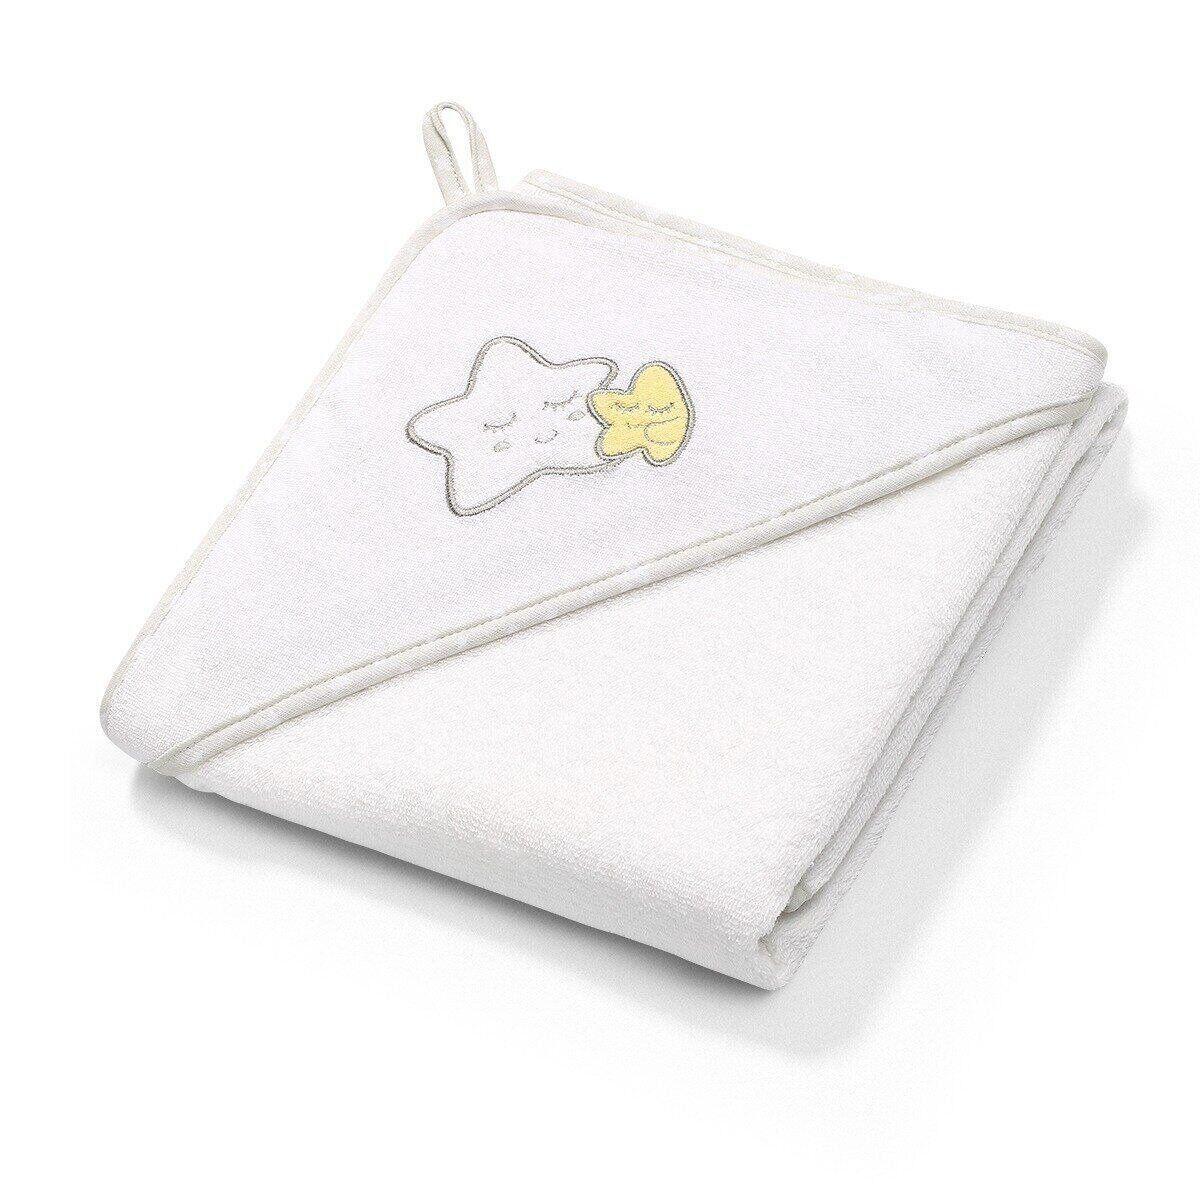 Полотенце махровое с капюшоном BabyOno 76x76 см Звездочки